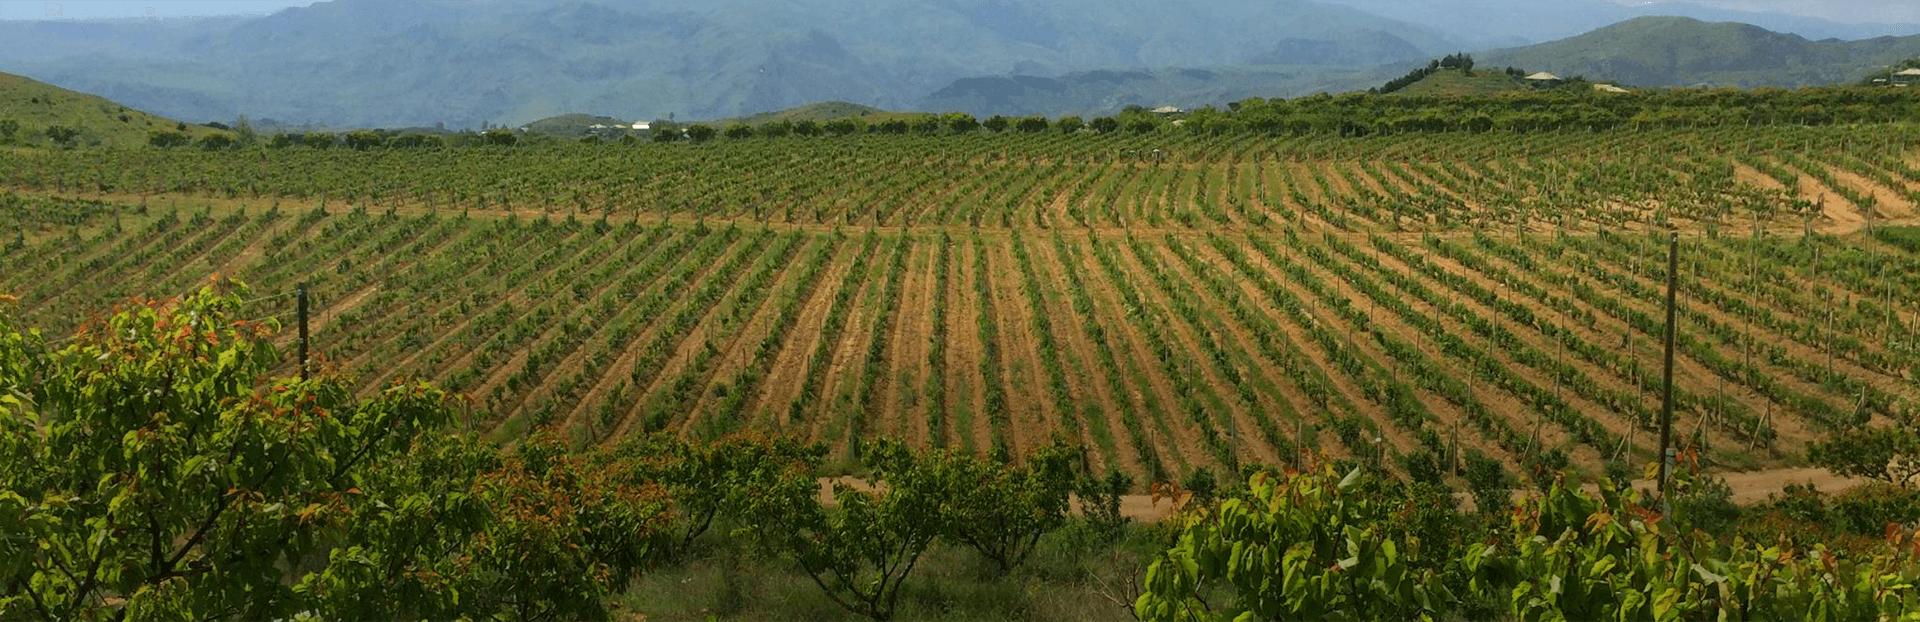 trinity wijngaard